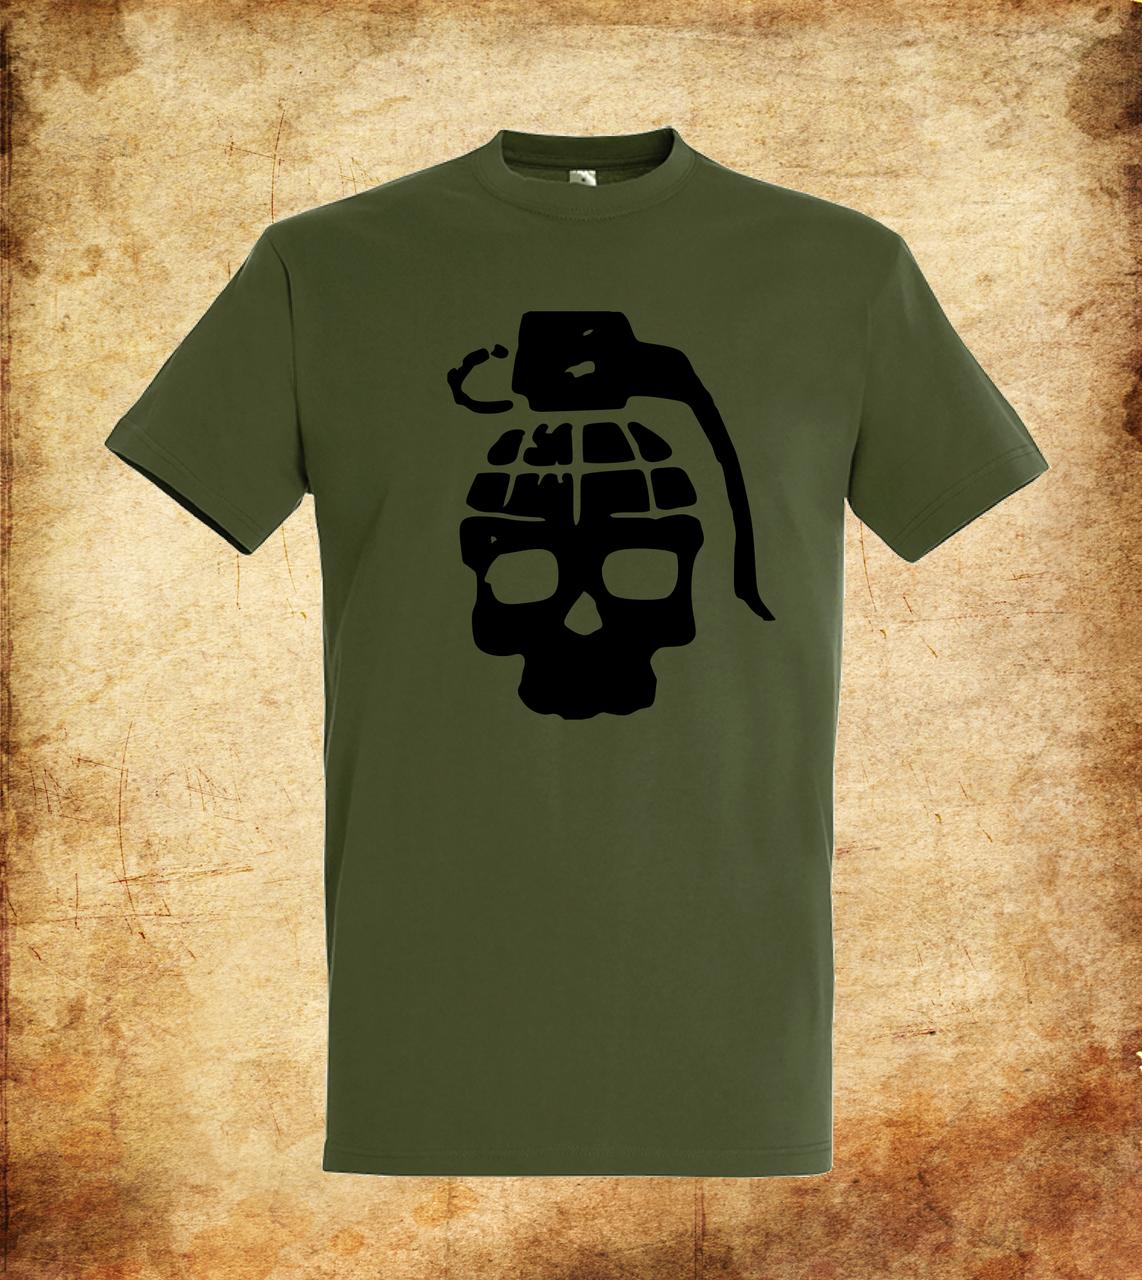 Футболка YOUstyle Grenade 0323 XL Army